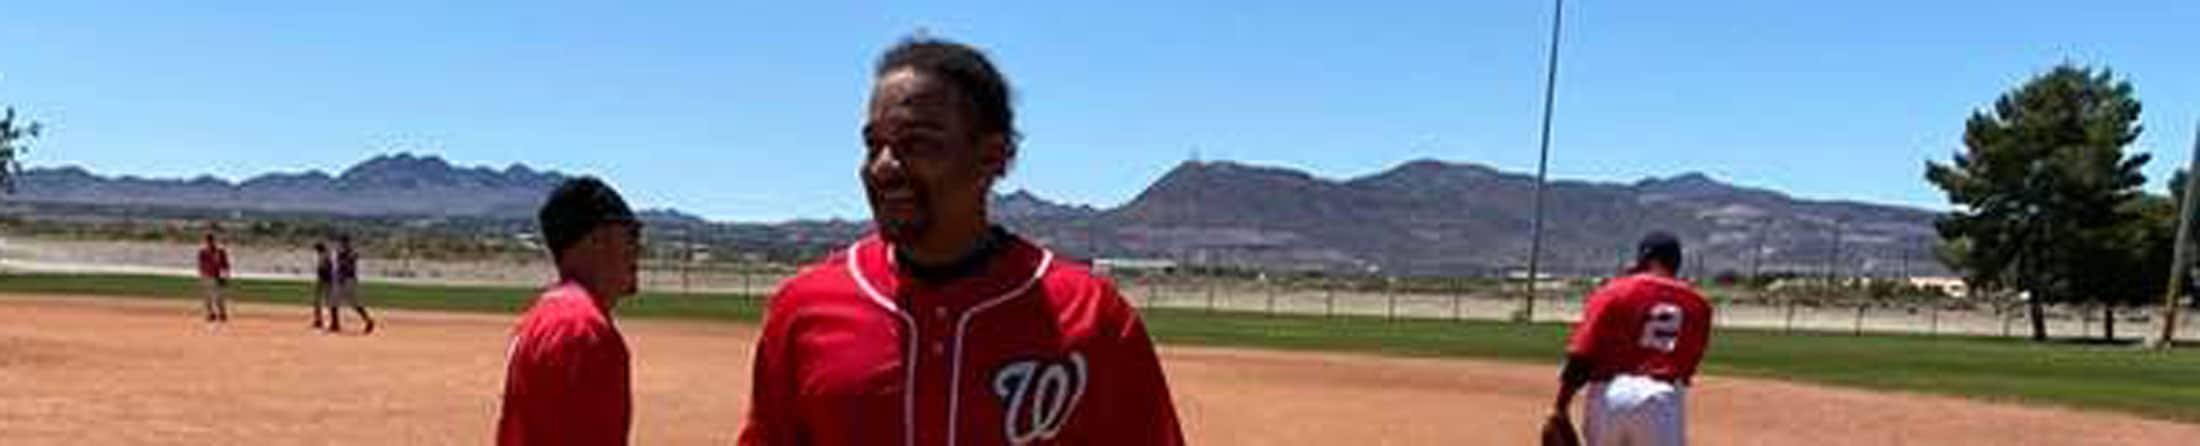 Las Vegas Baseball in a Pandemic